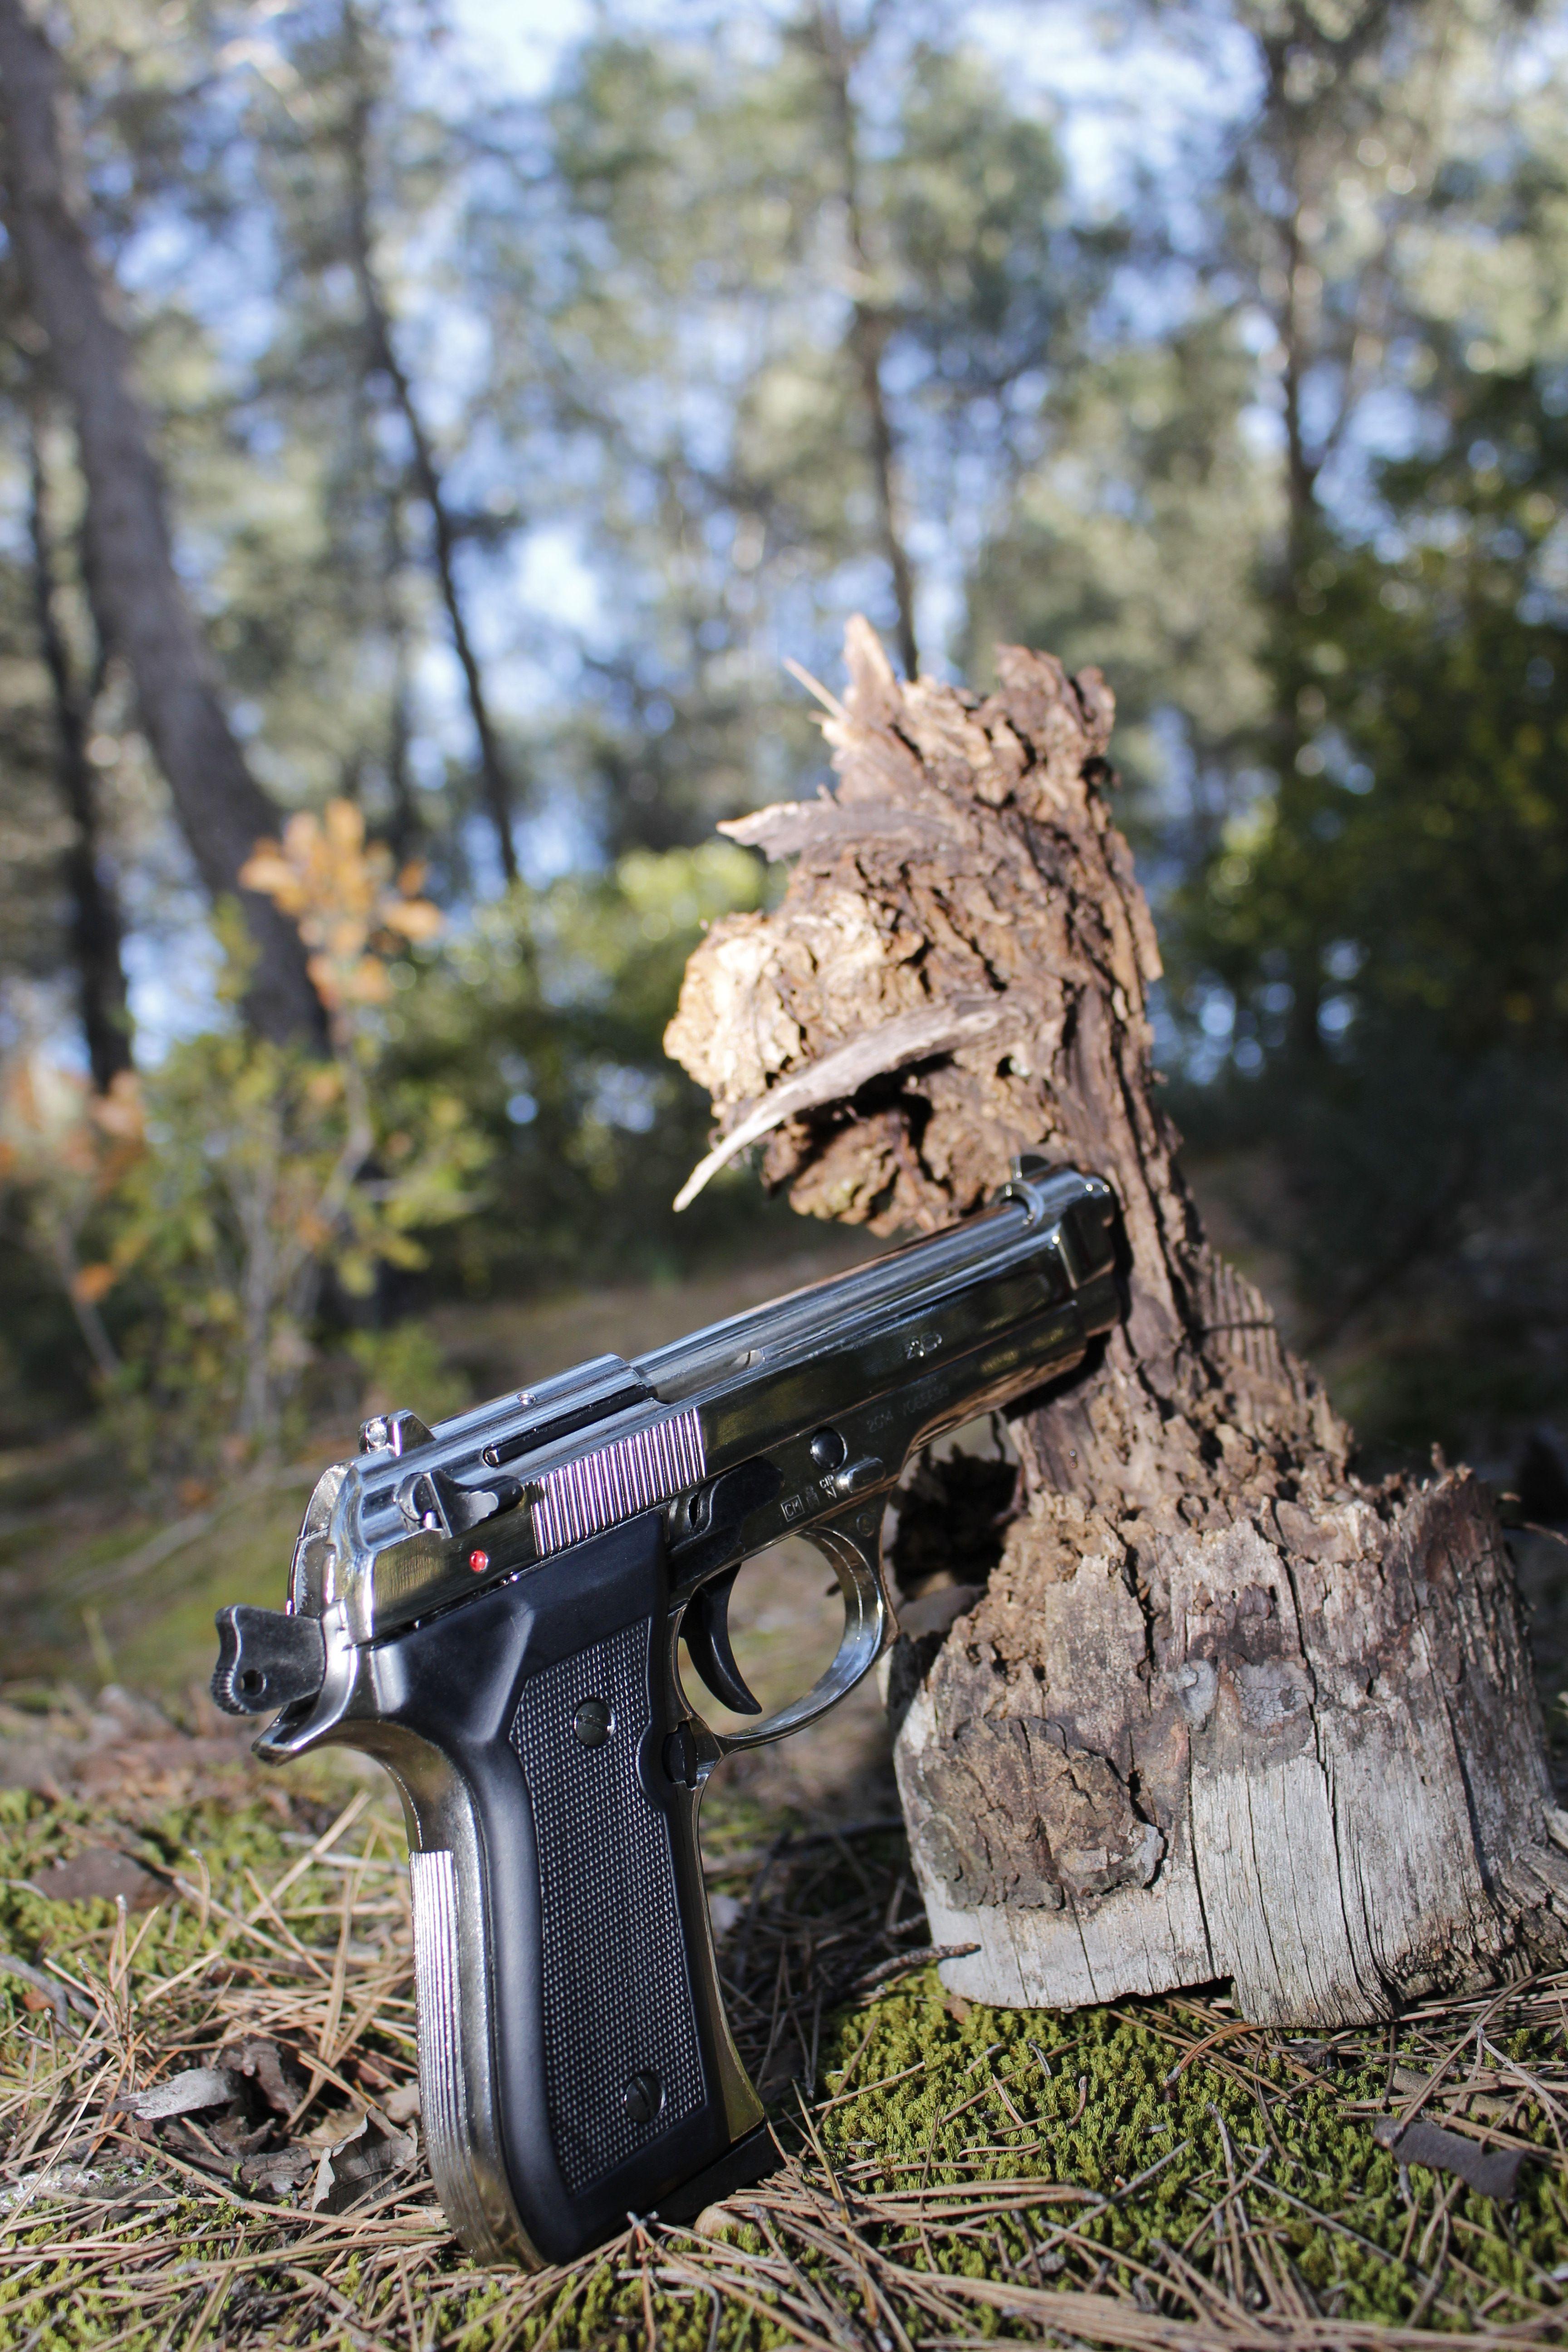 pistola en la naturaleza, contrastes, fotografia artistica.